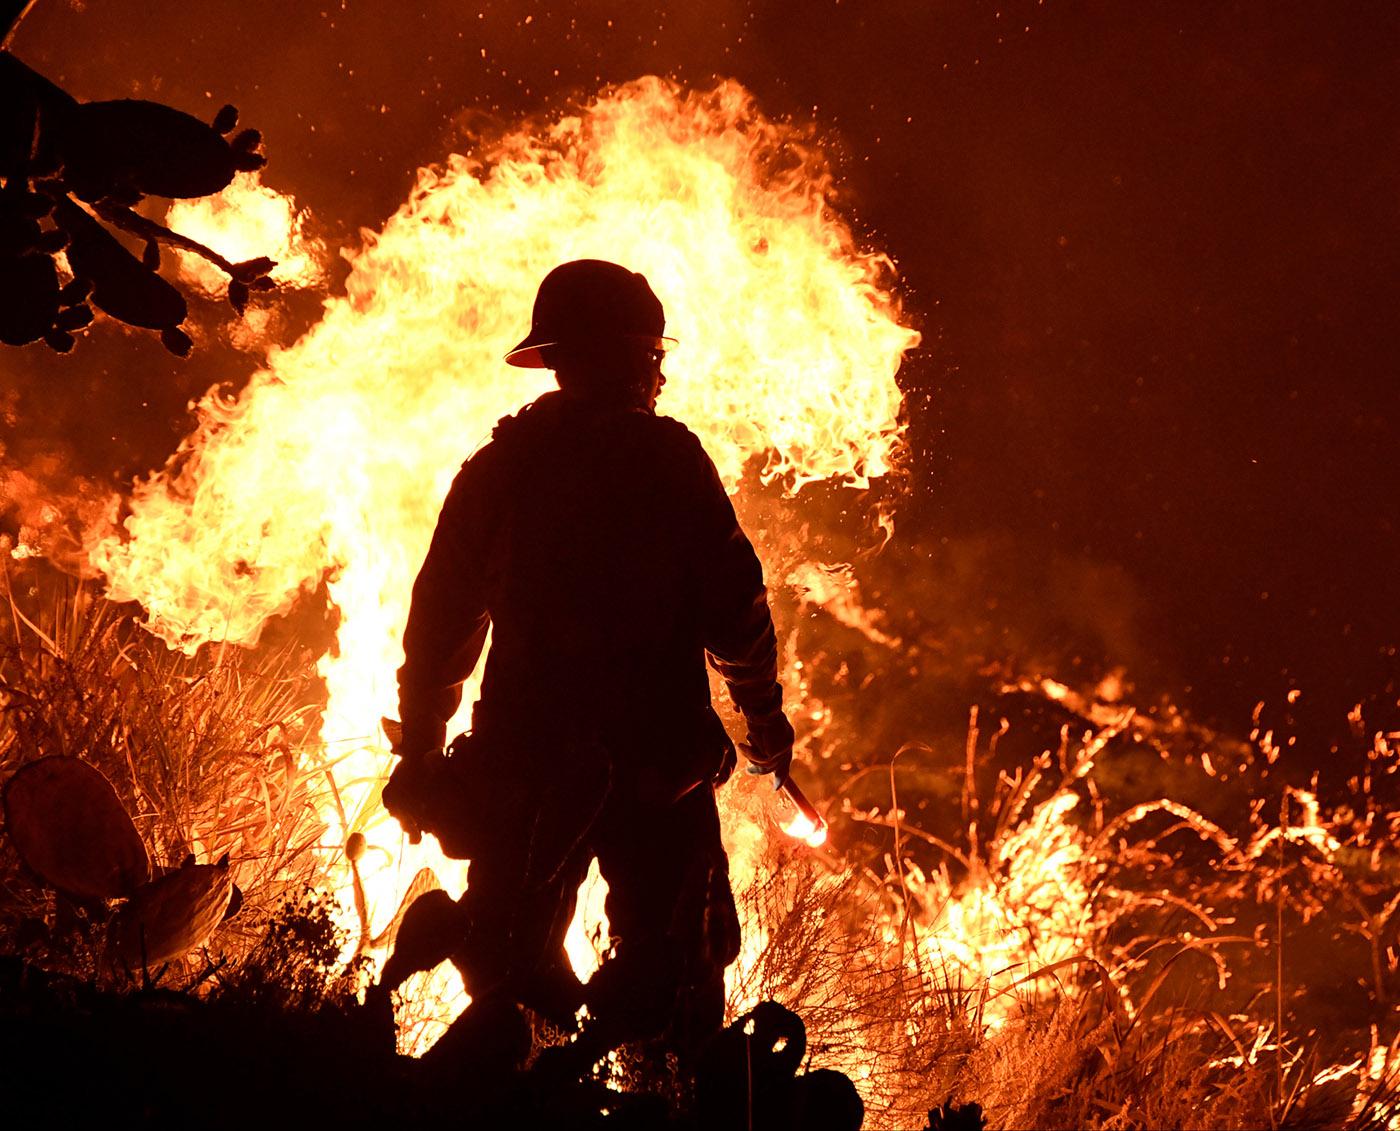 Firefighters battle a Santa Ana wind-driven brush fire called the Thomas Fire near Ventura, California, December 5, 2017. (Reuters Photo)